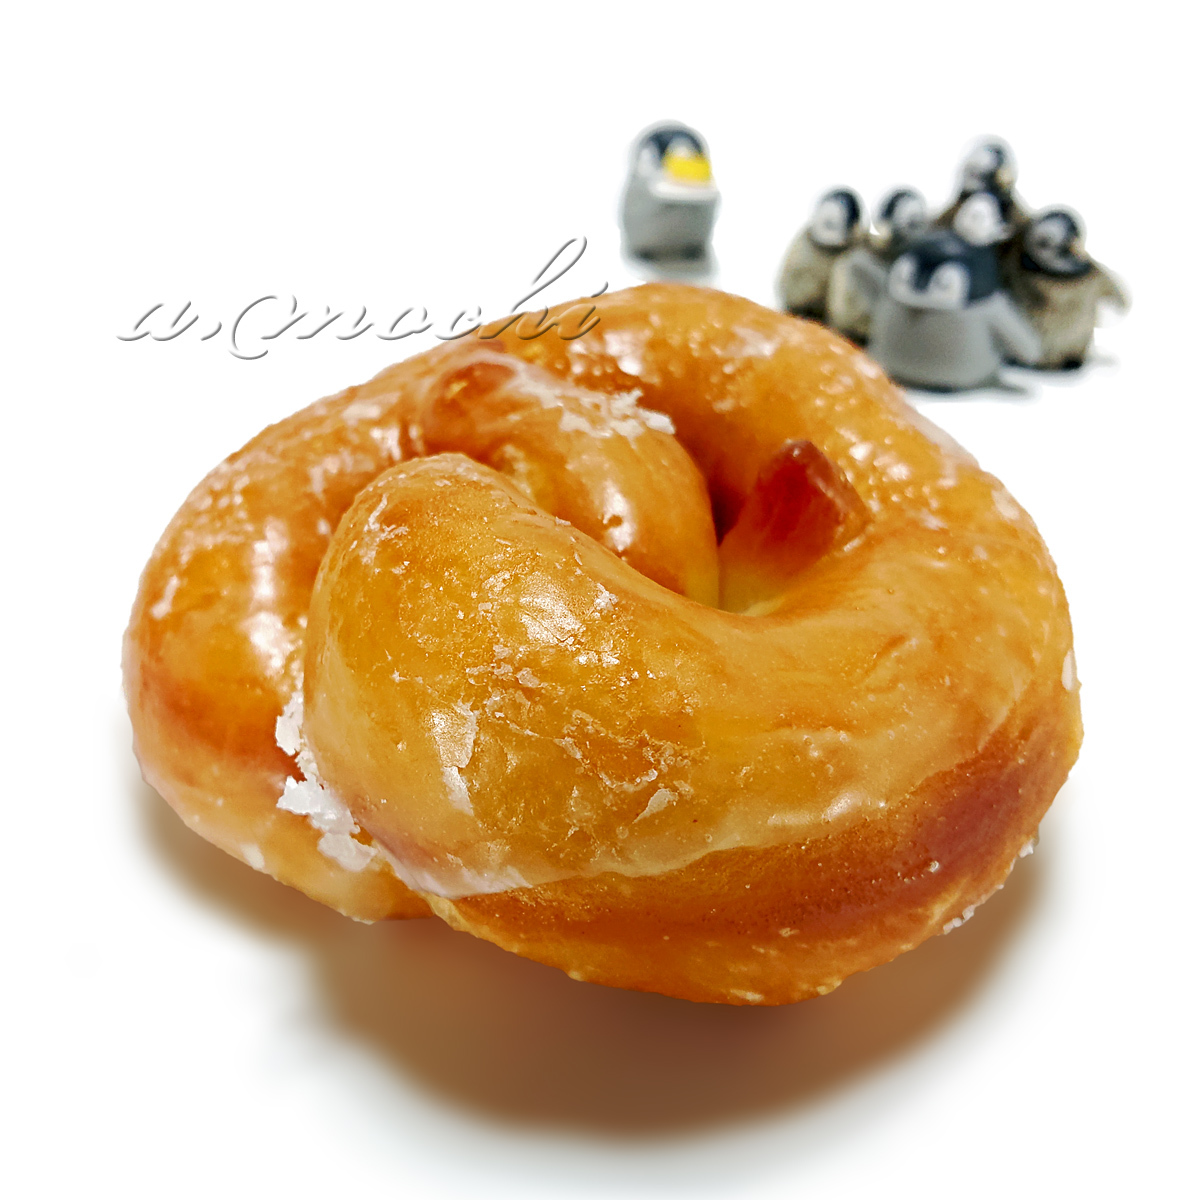 gezun7_donuts.jpg